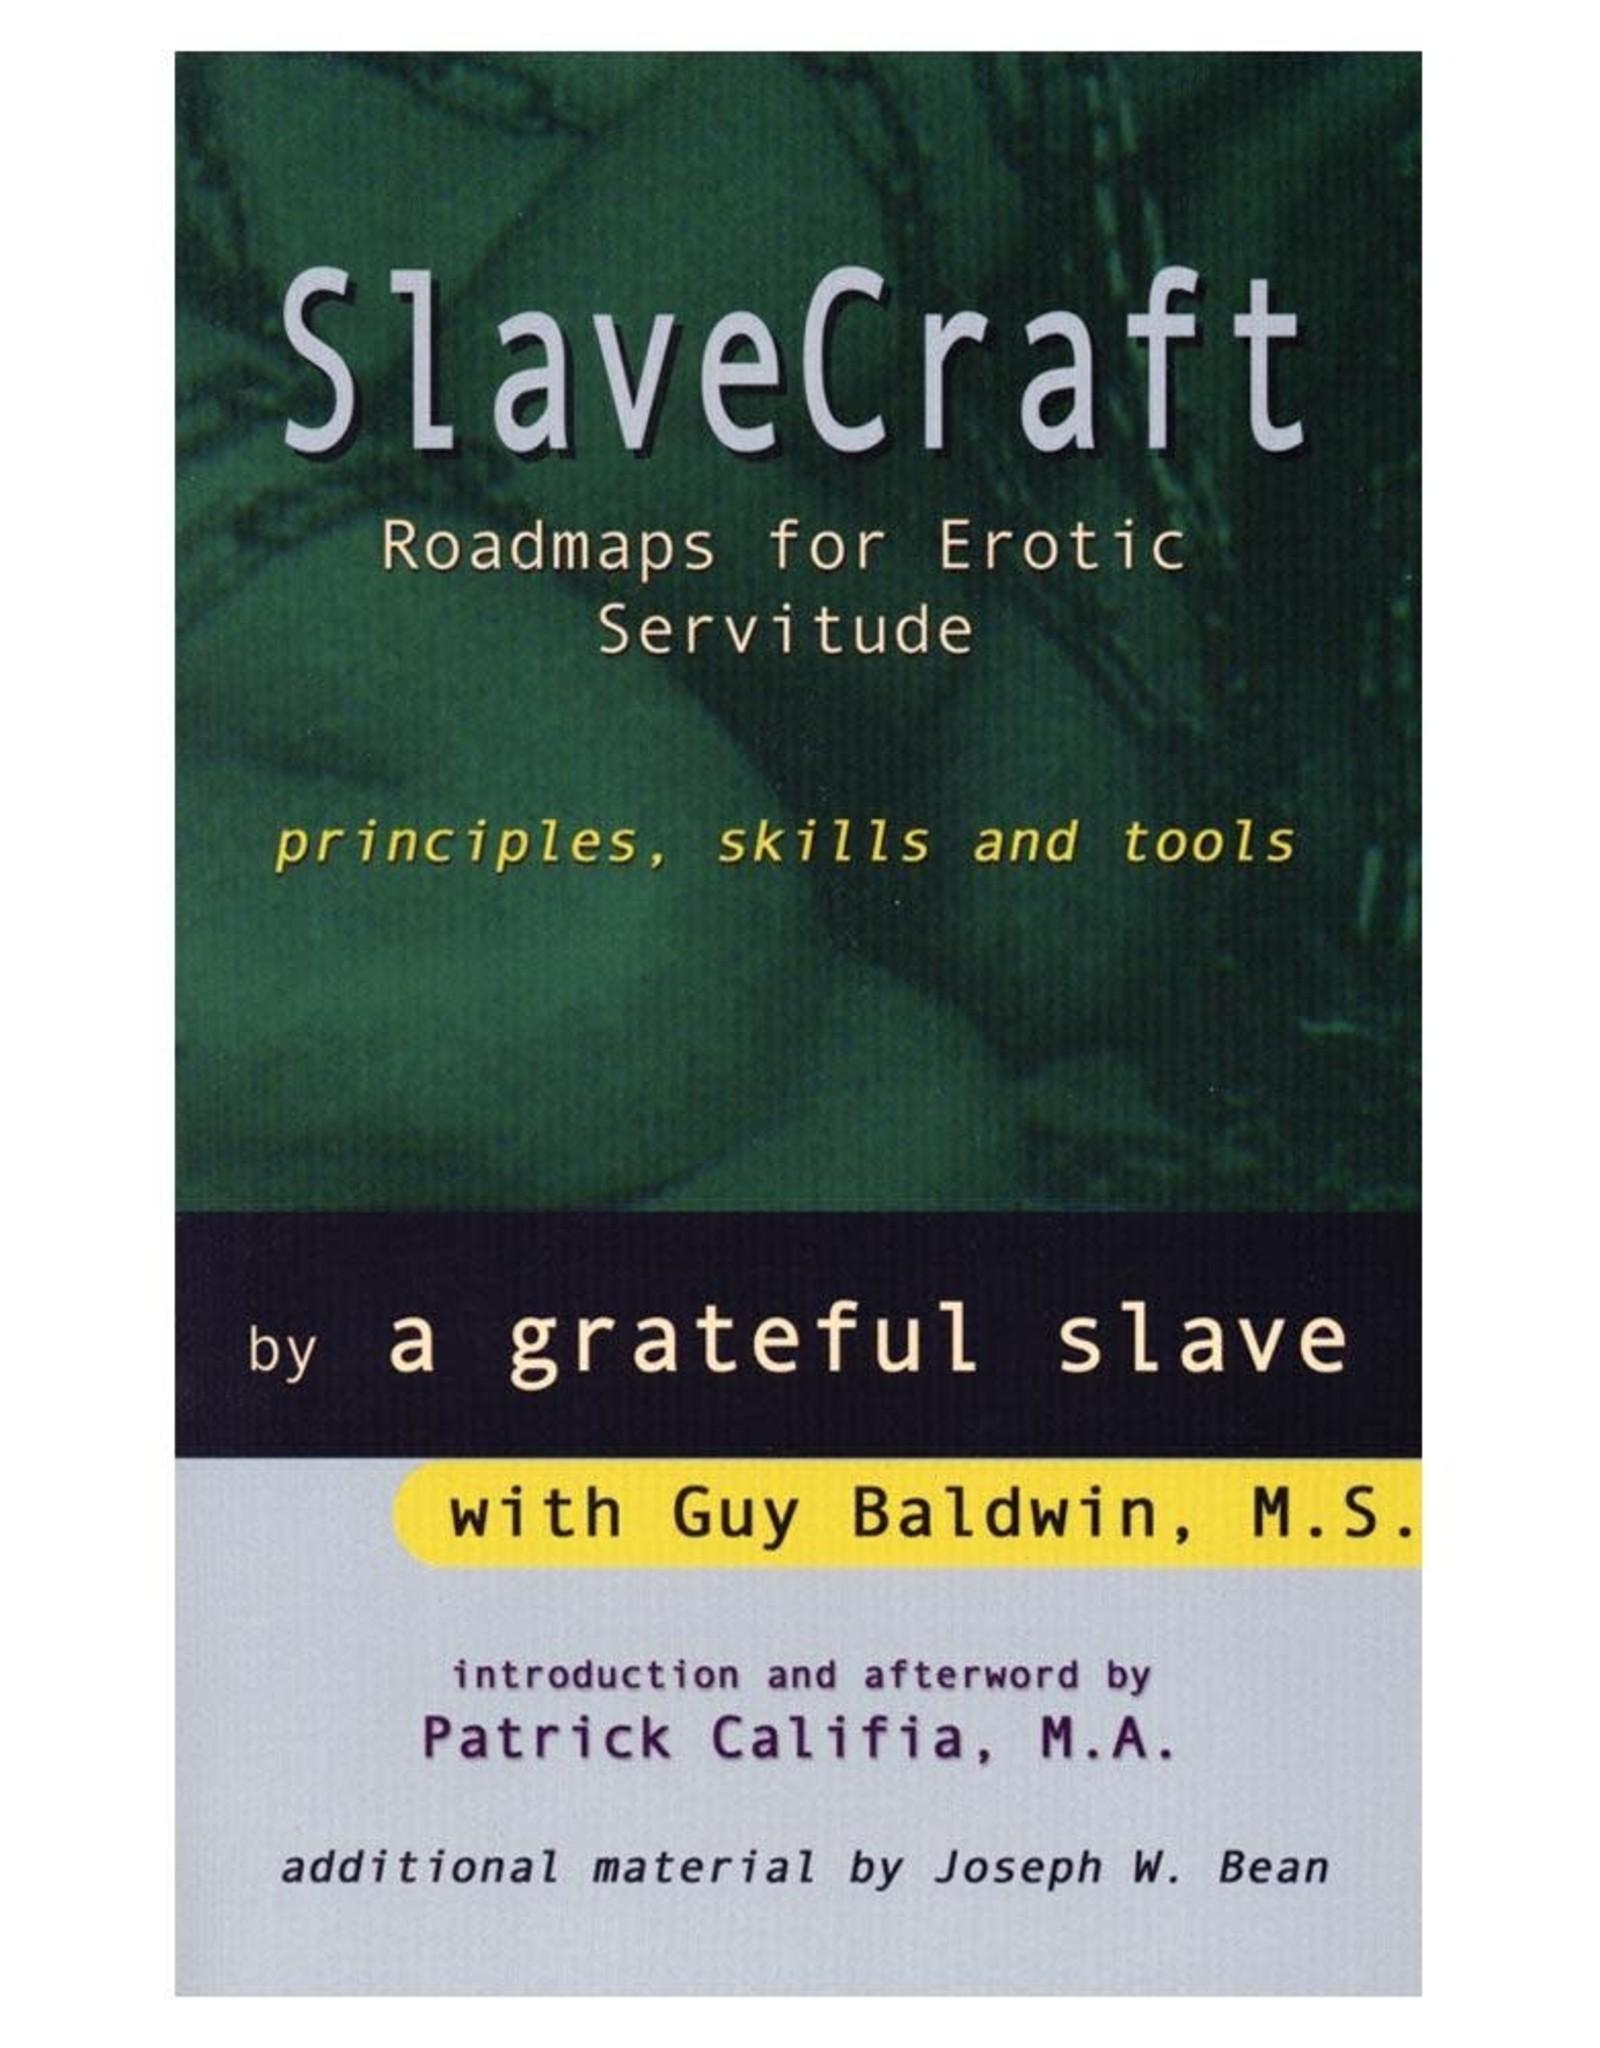 Stockroom Stockroom Books SlaveCraft: Roadmaps for Erotic Servitude by a grateful slave